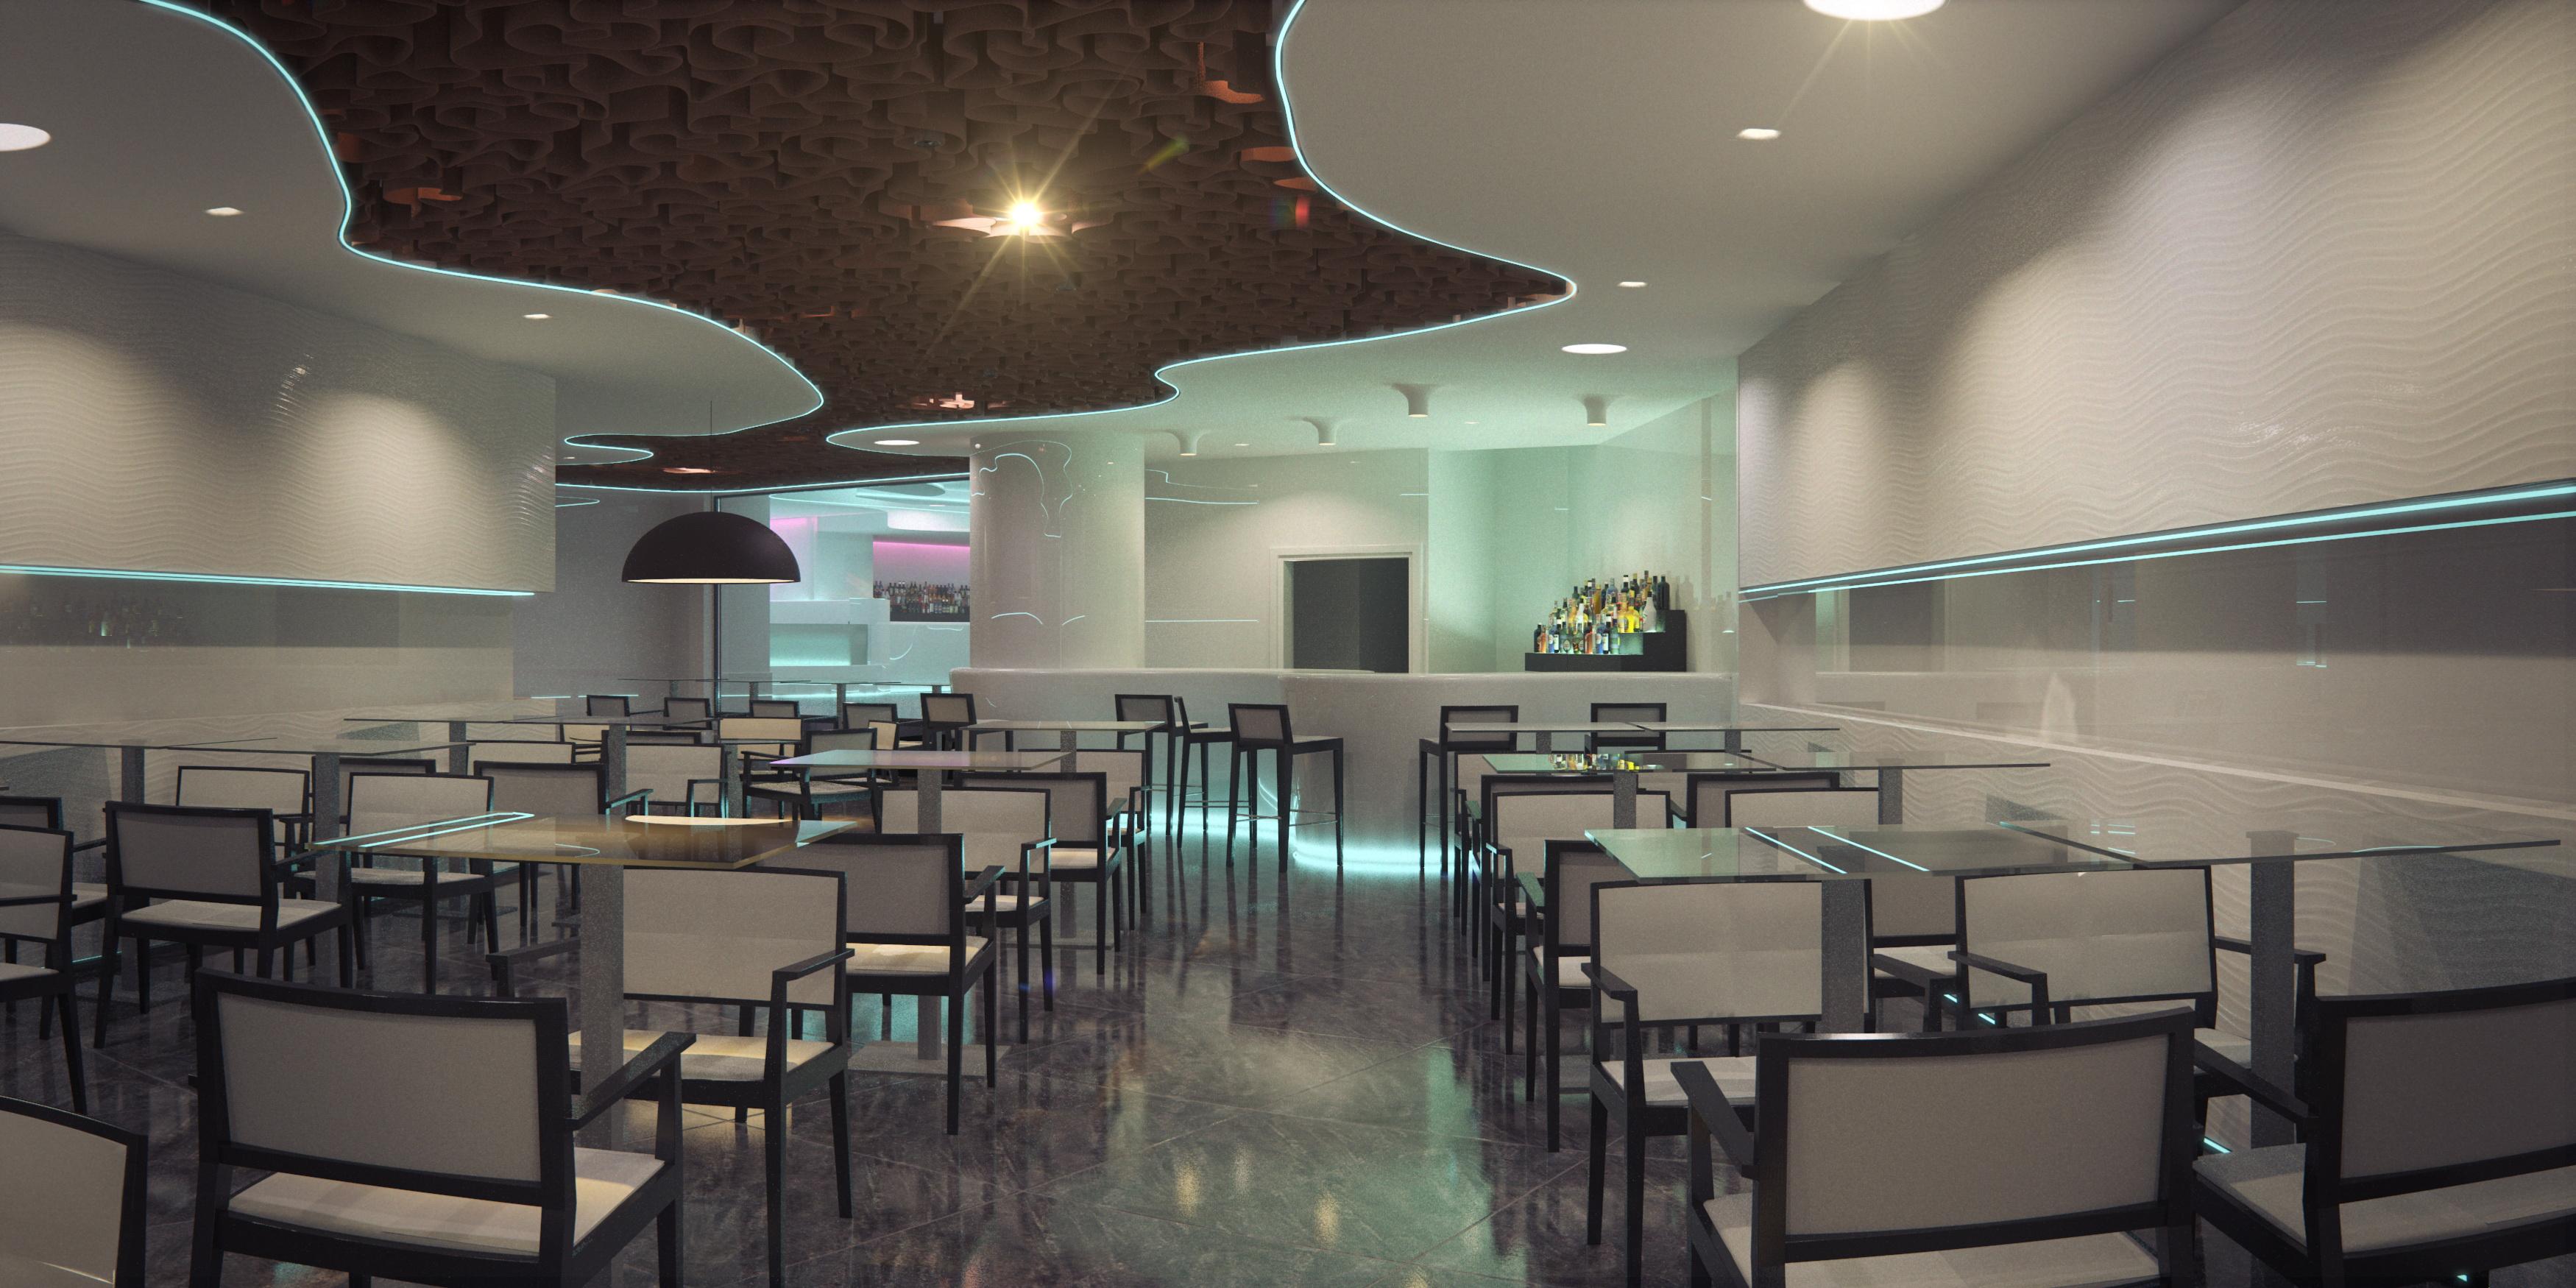 Interiorismo restaurante discoteca cuantico infografia - Interiores de salones ...